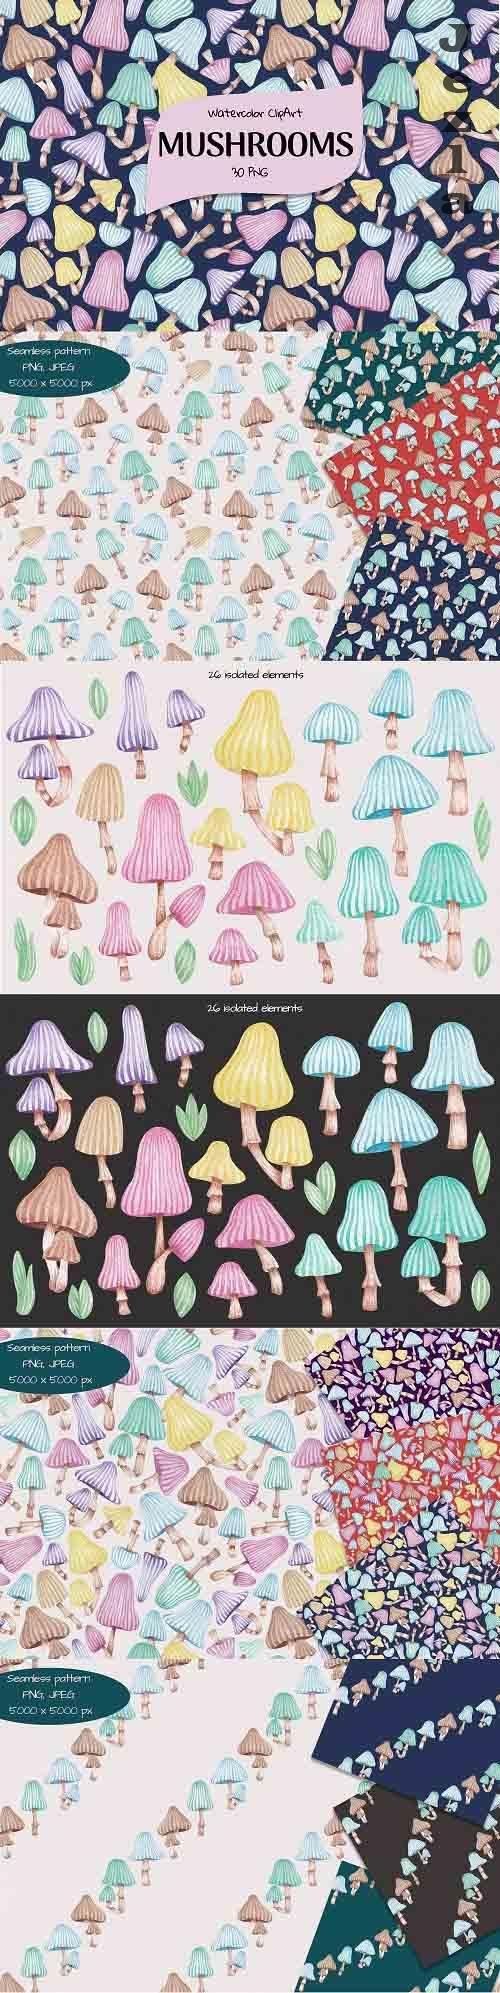 Watercolor ClipArt Mushrooms - 1389527